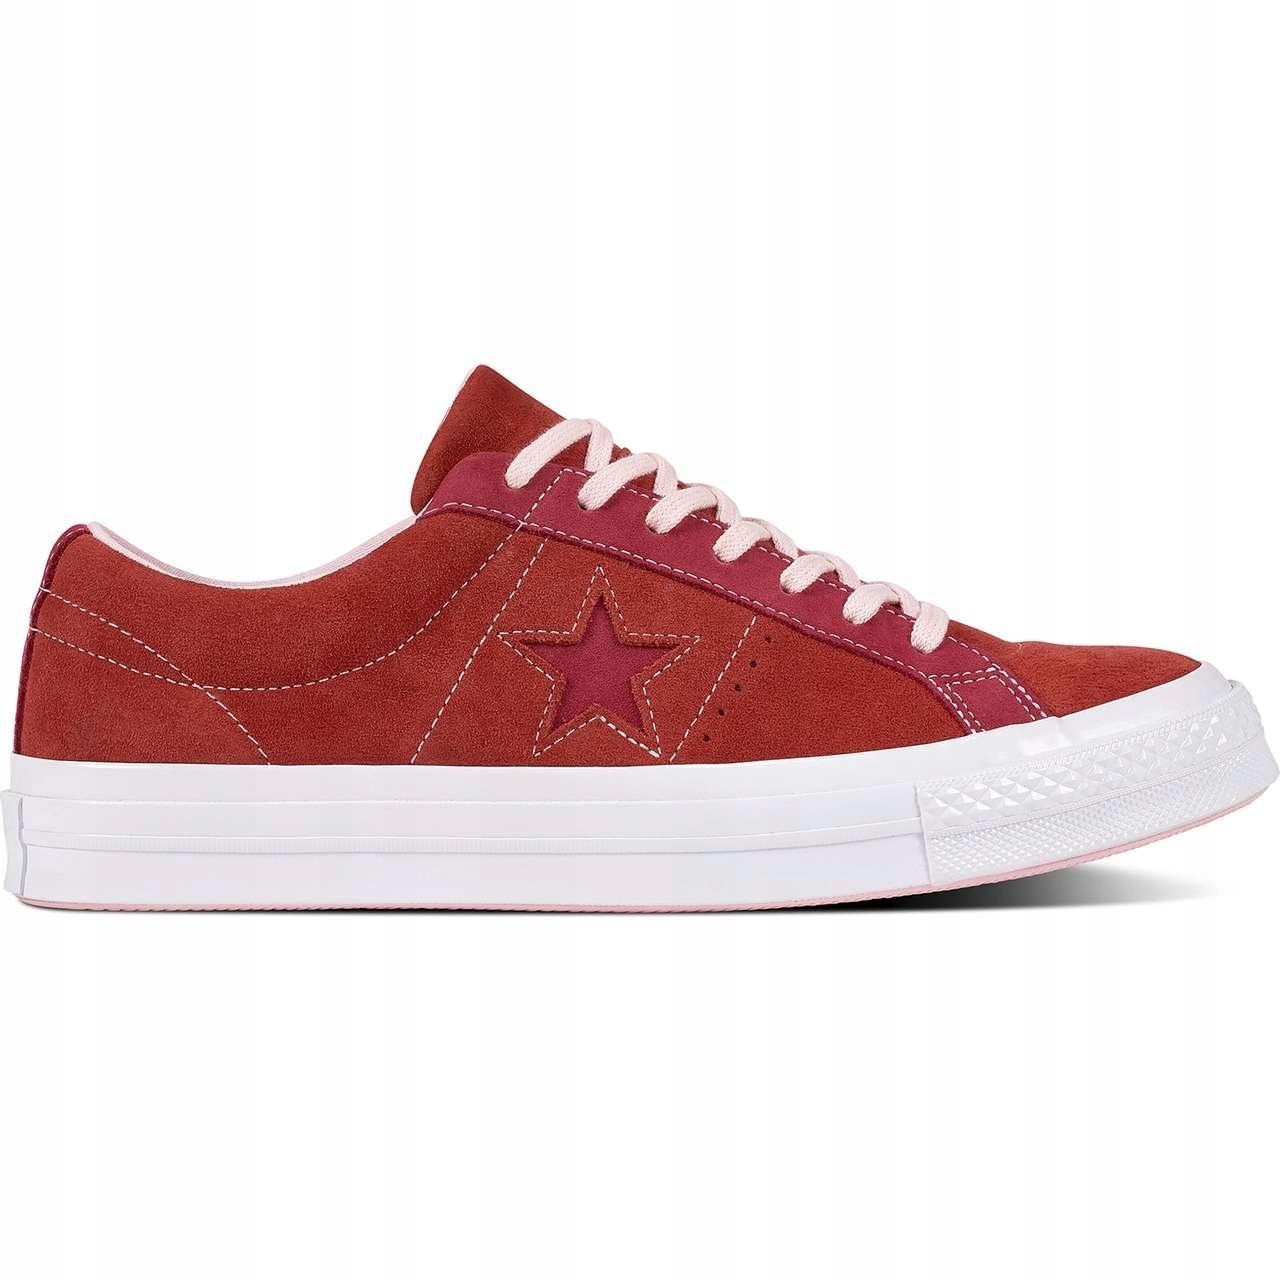 Damskie Trampki CONVERSE C161613 ONE STAR C ~36,5